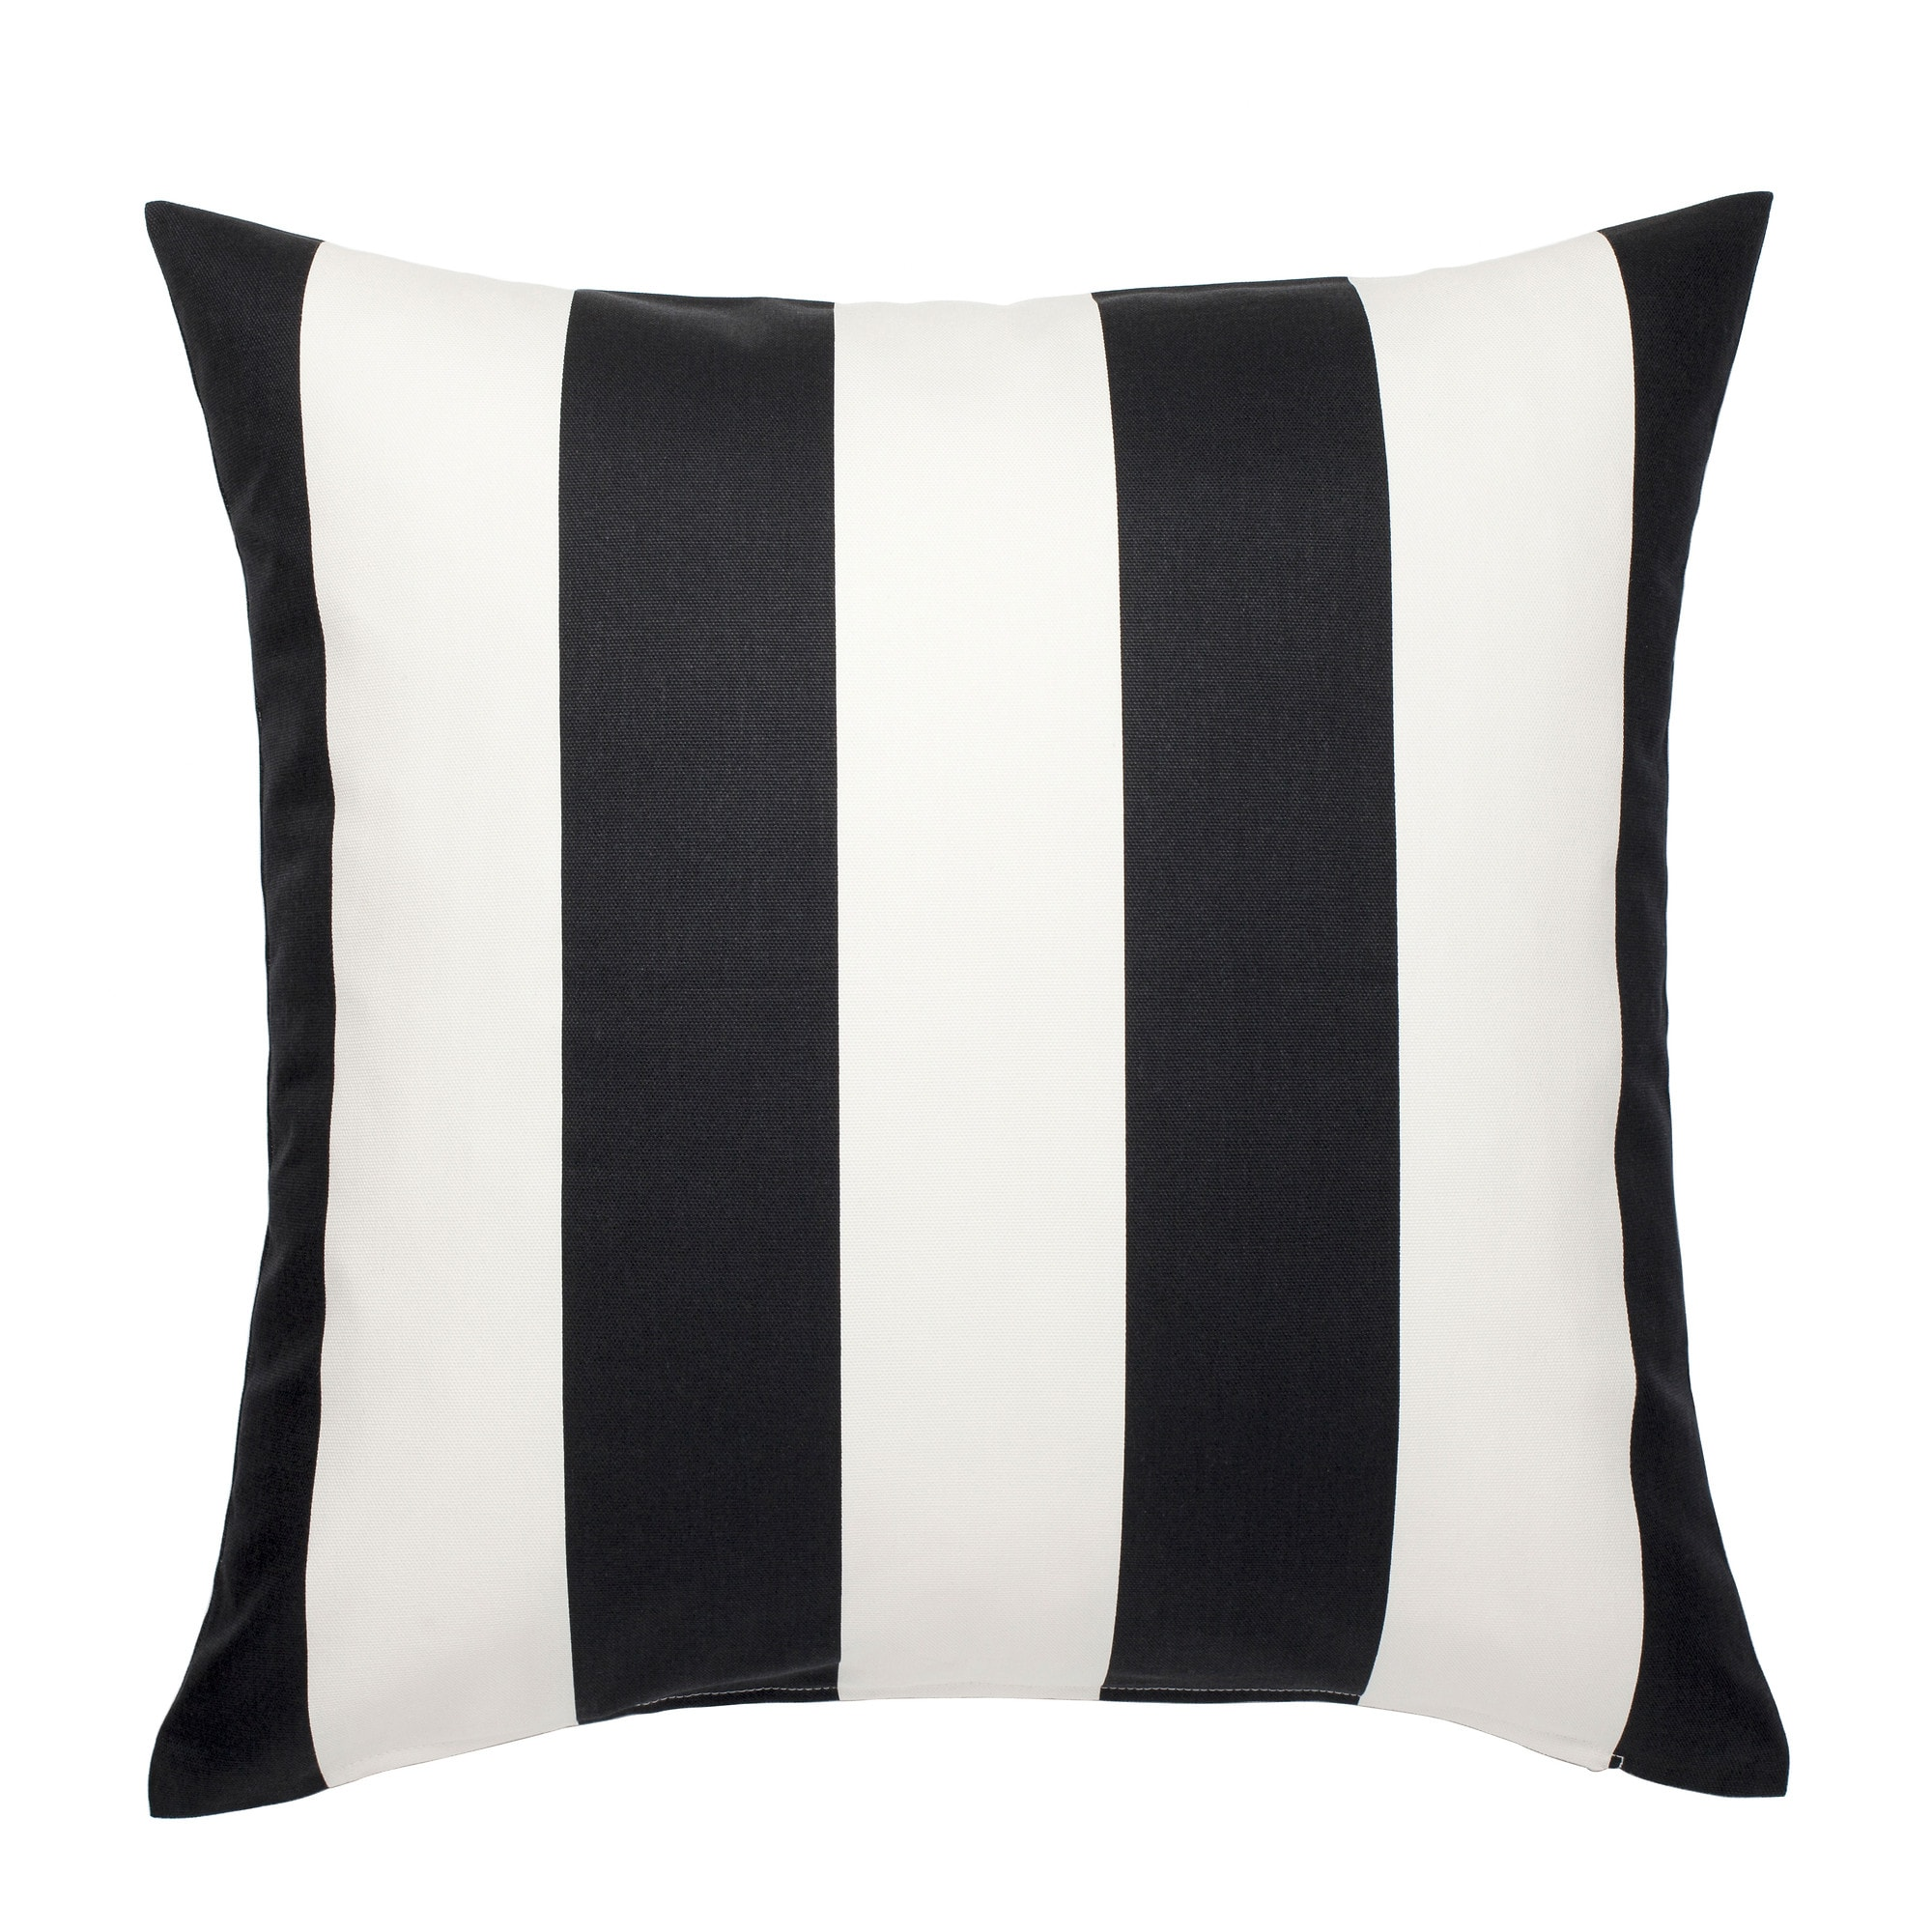 Black & White Striped Pillow (2)